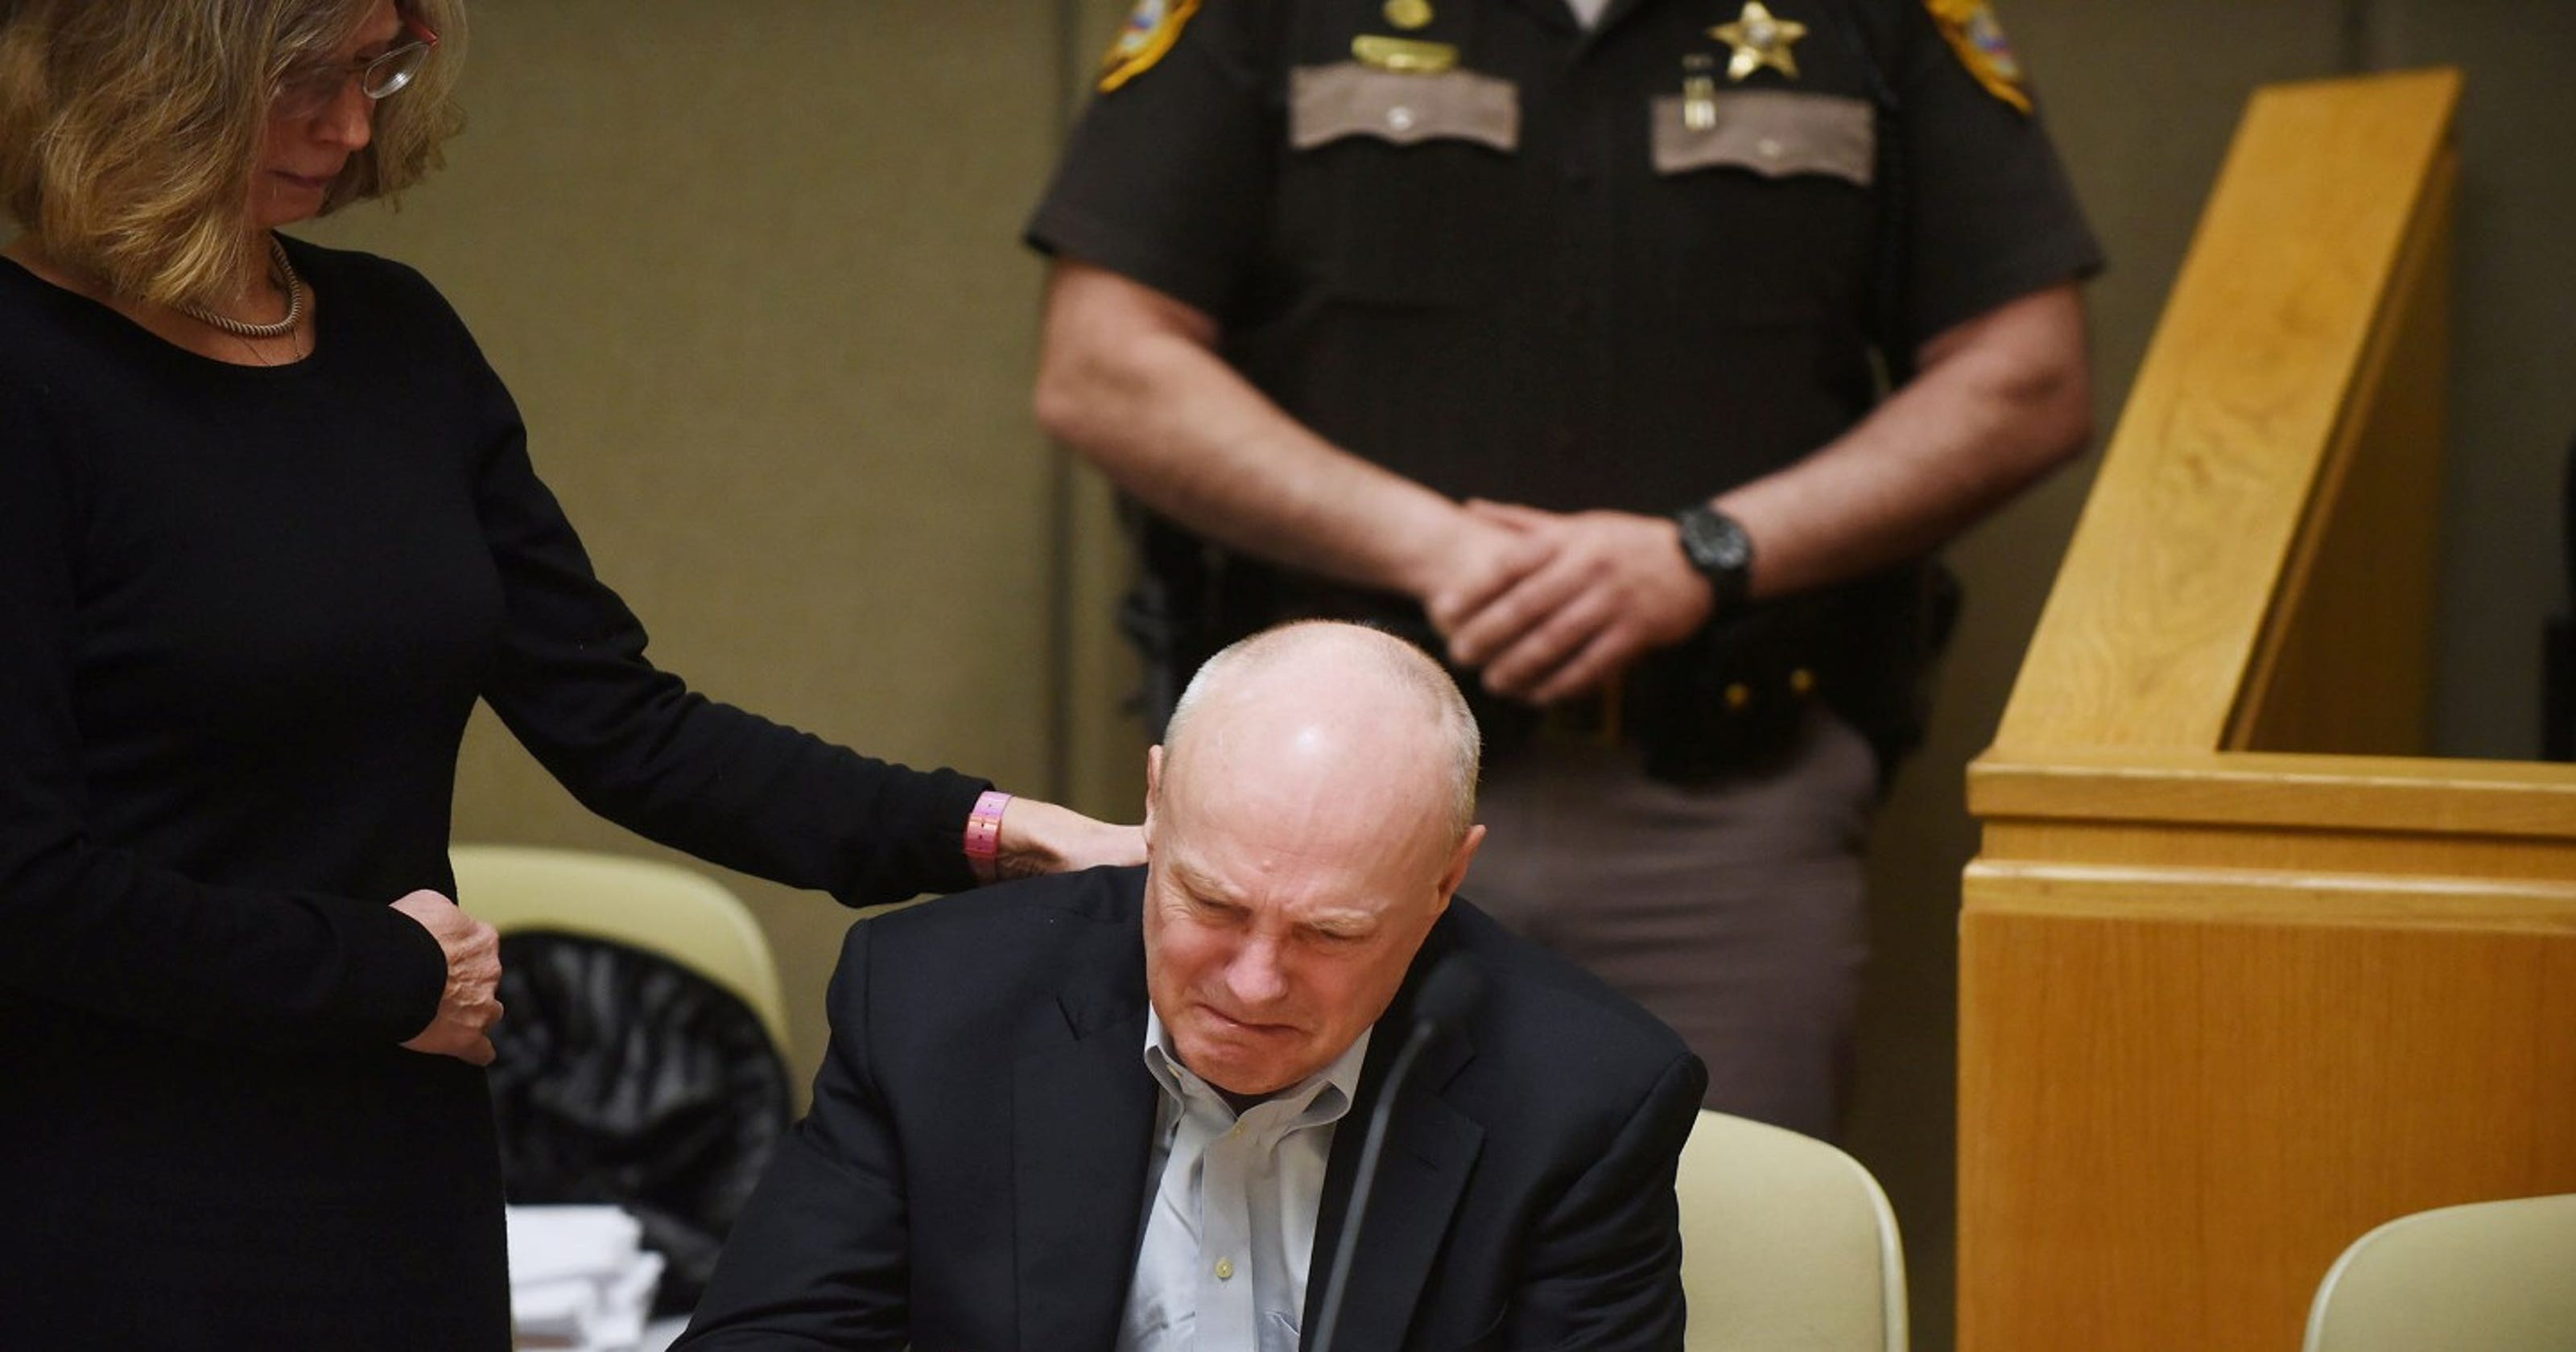 Victims' family at exec's crash sentencing: You're heartless